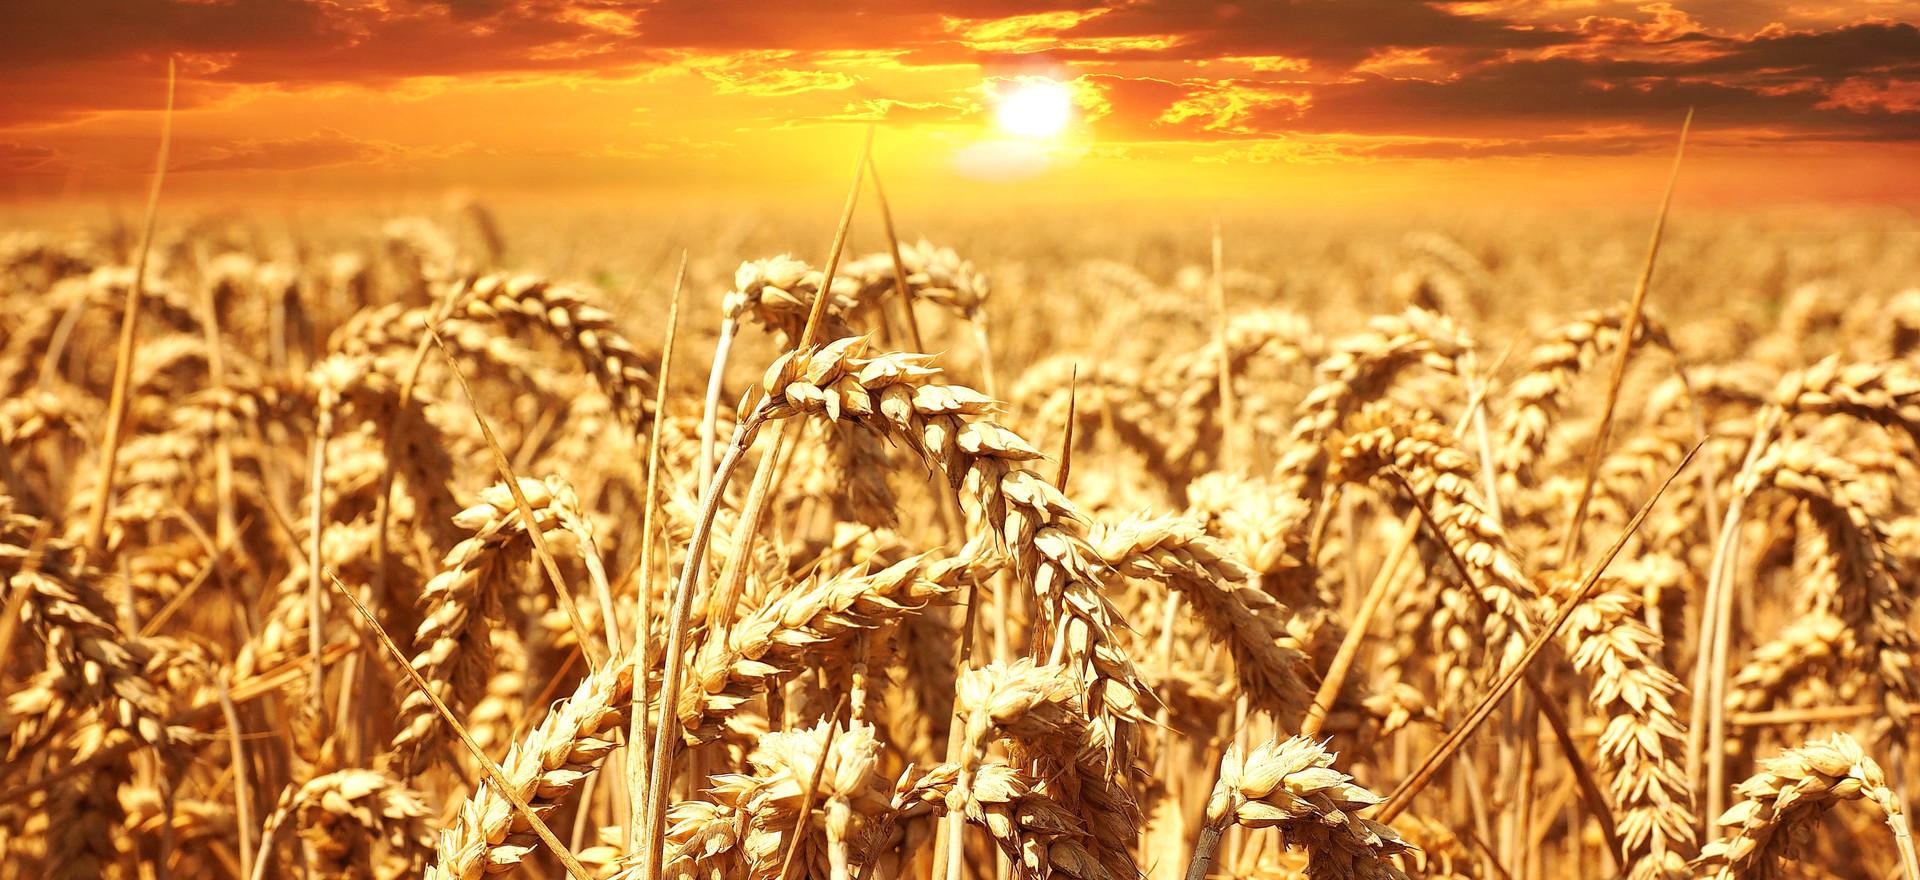 sunset-cereals-grain-lighting-39015.jpg